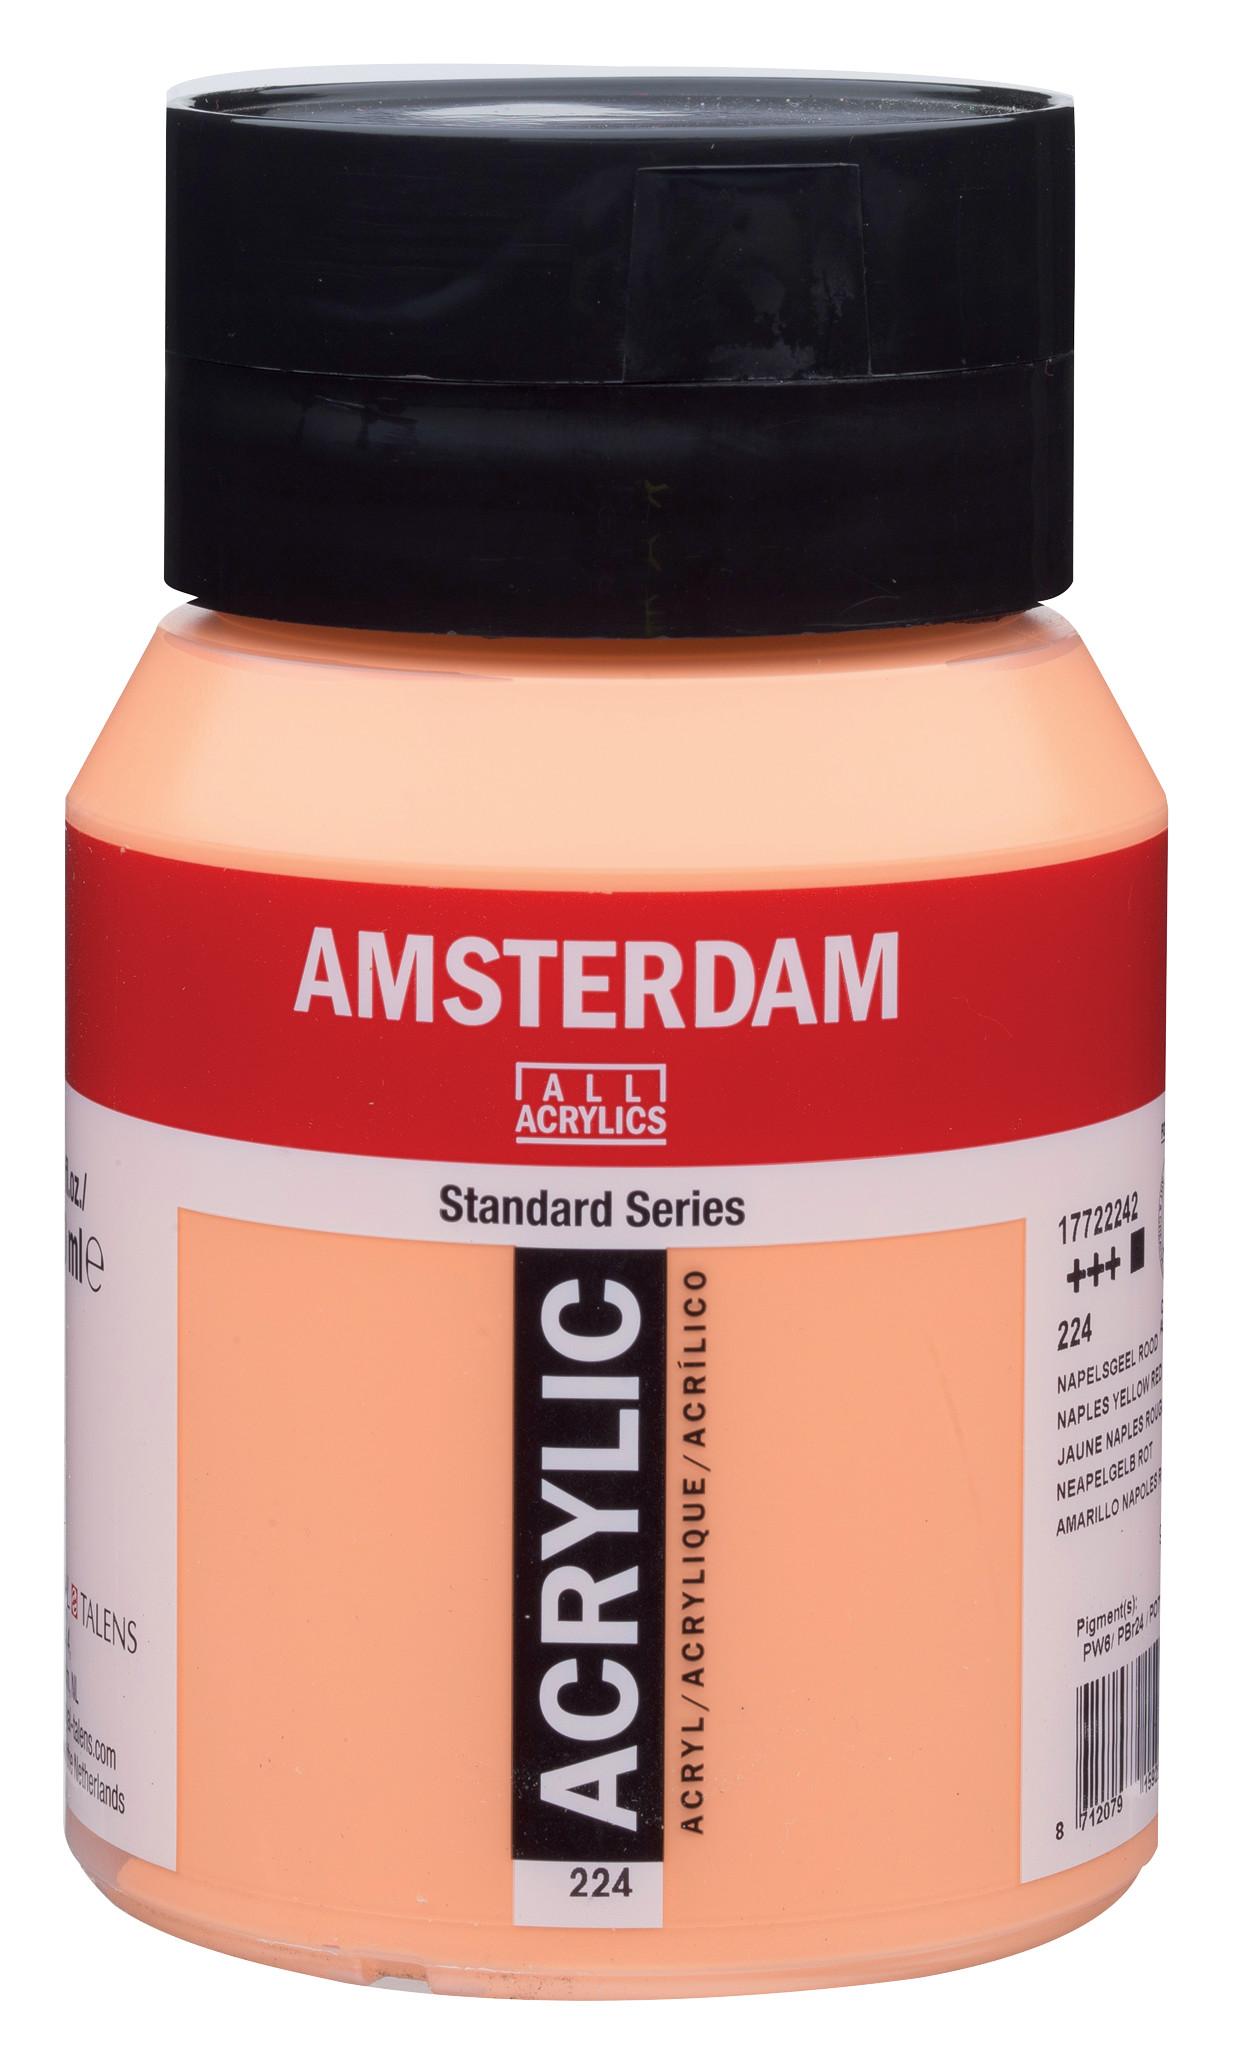 Amsterdam Standard Series Acrylic Jar 500 ml Naples yellow red 224